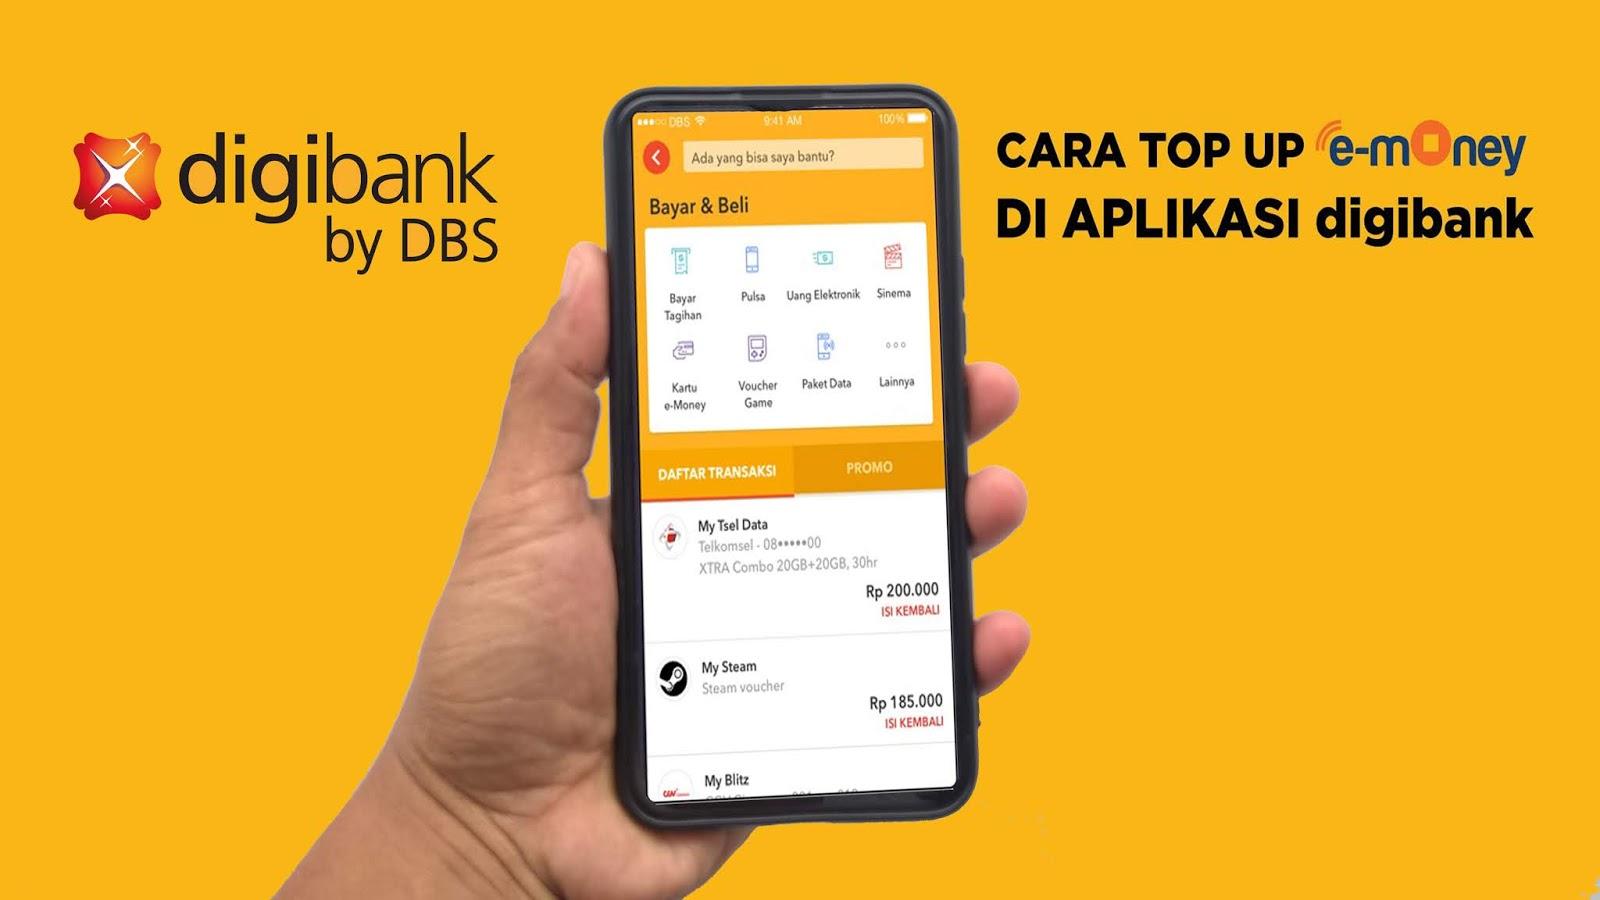 Top Up E-Money dari Aplikasi digibank by DBS